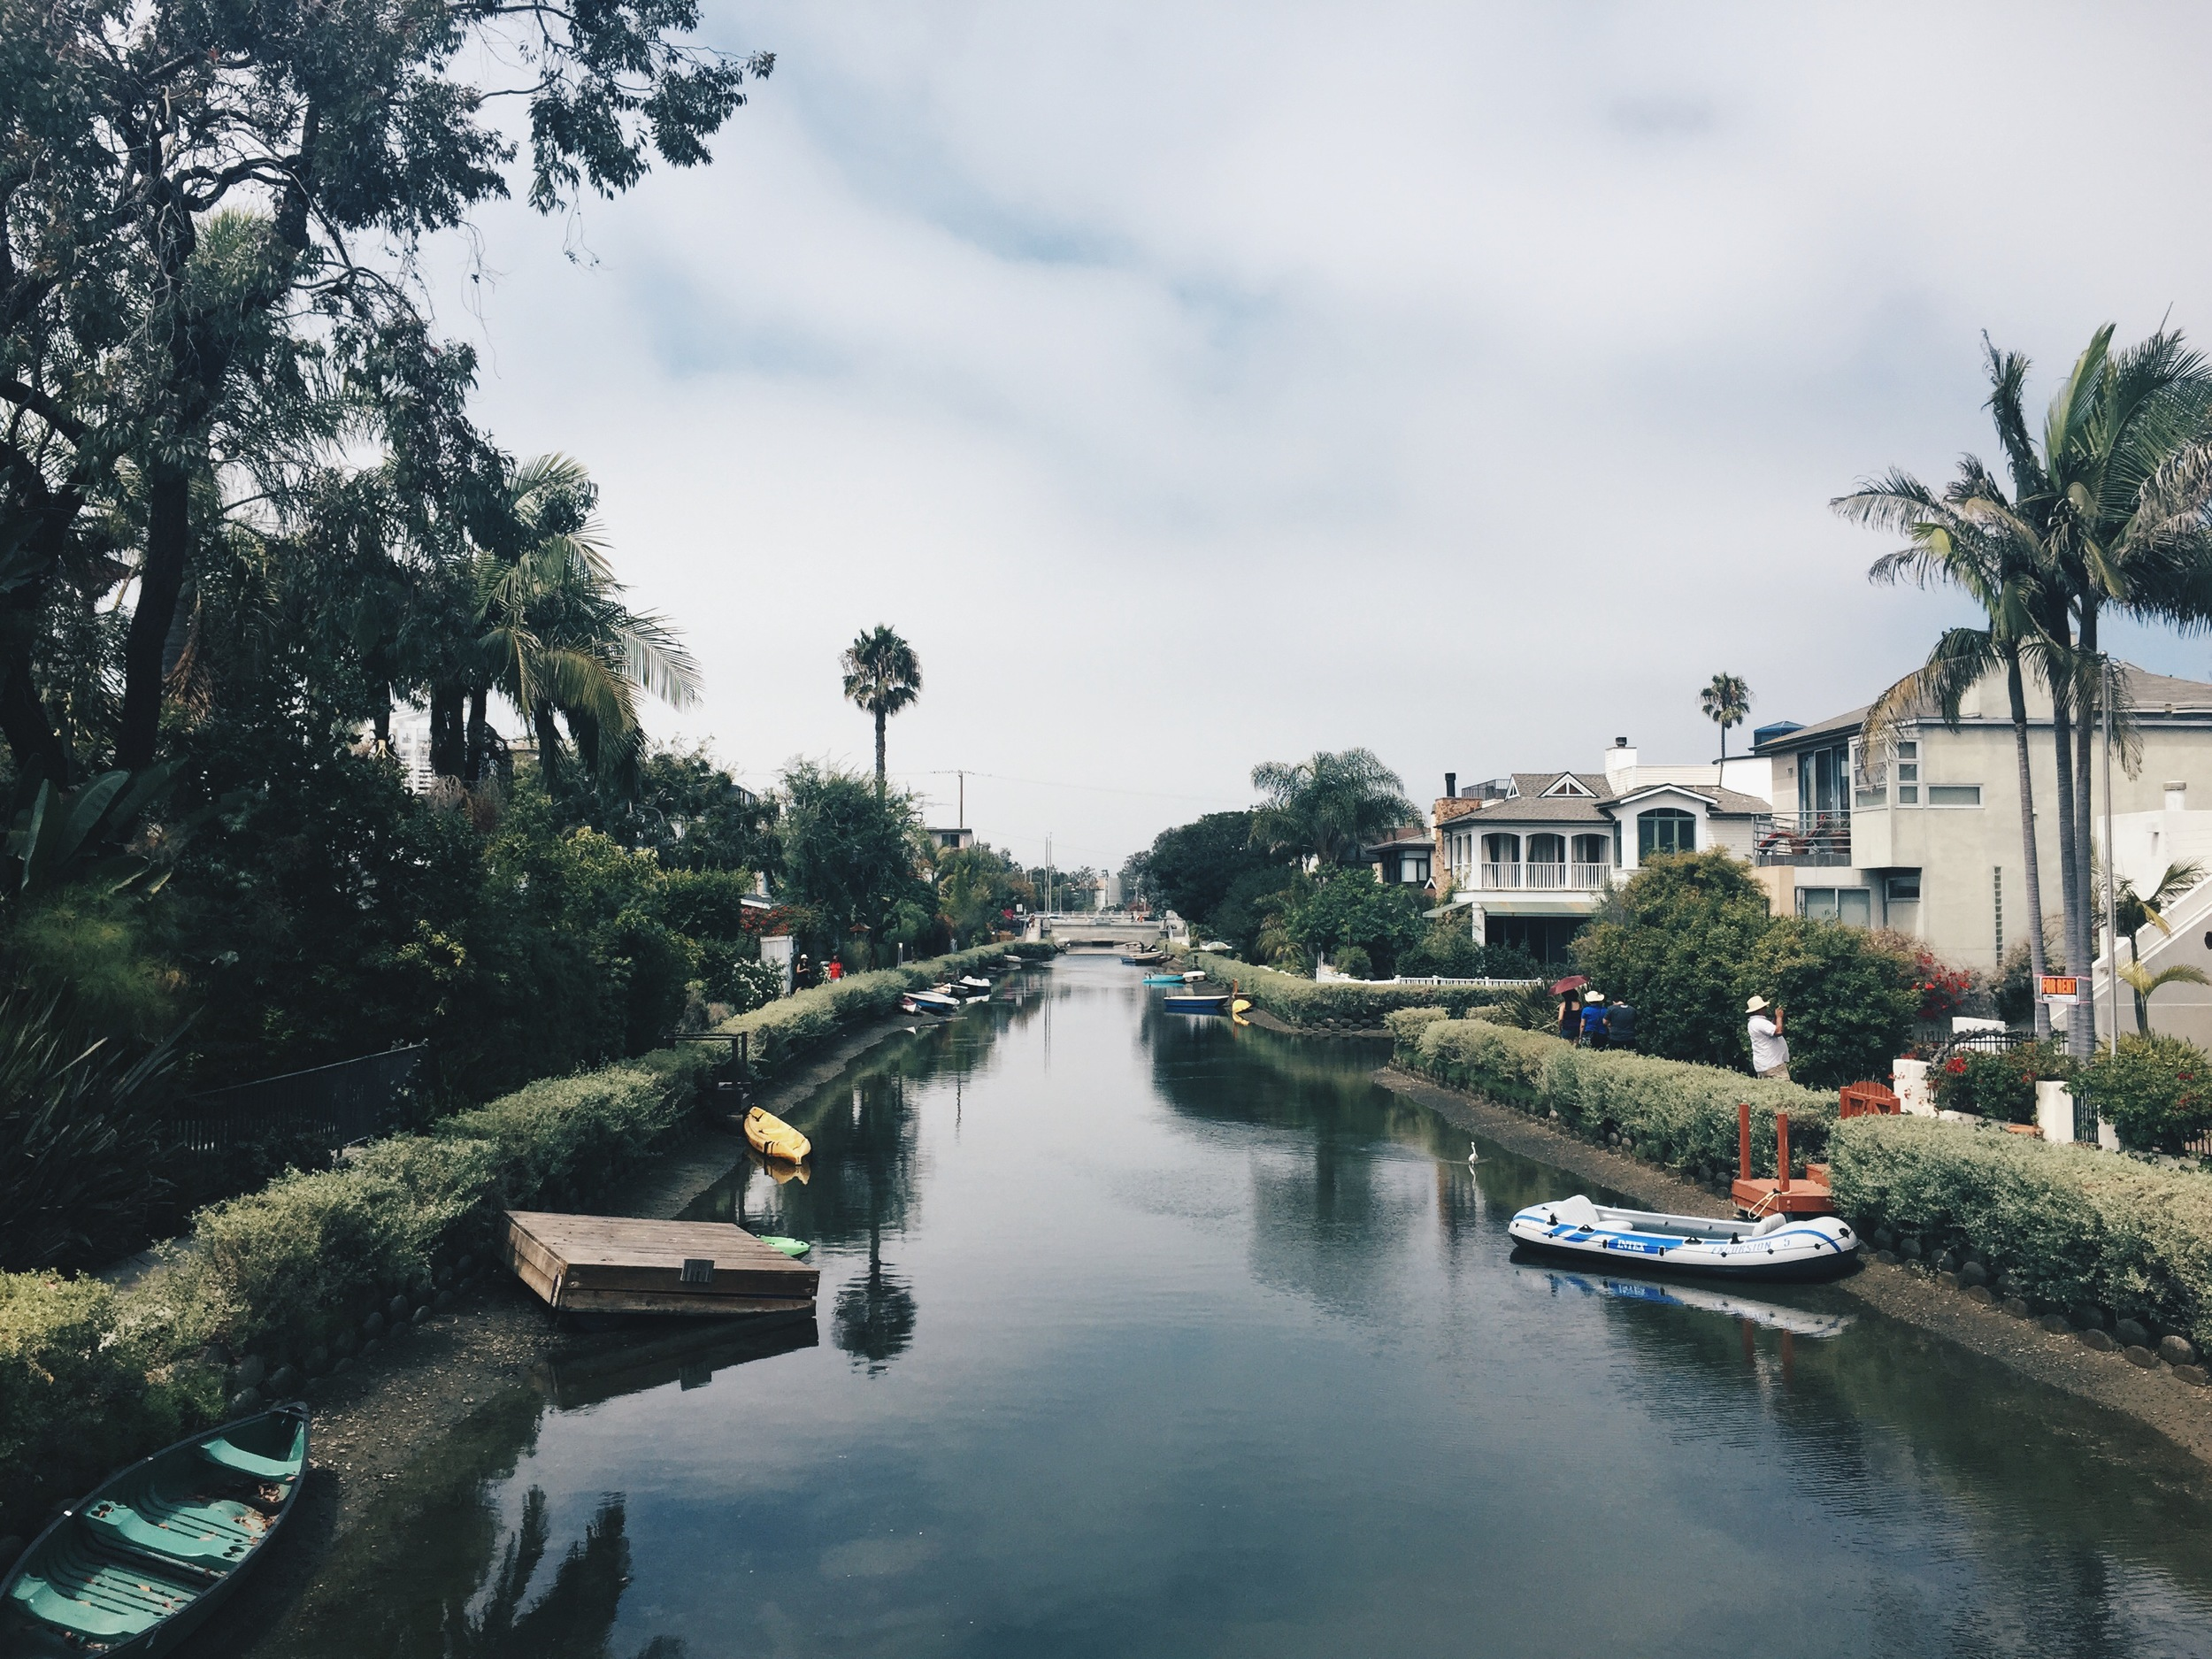 venice canals, venice beach